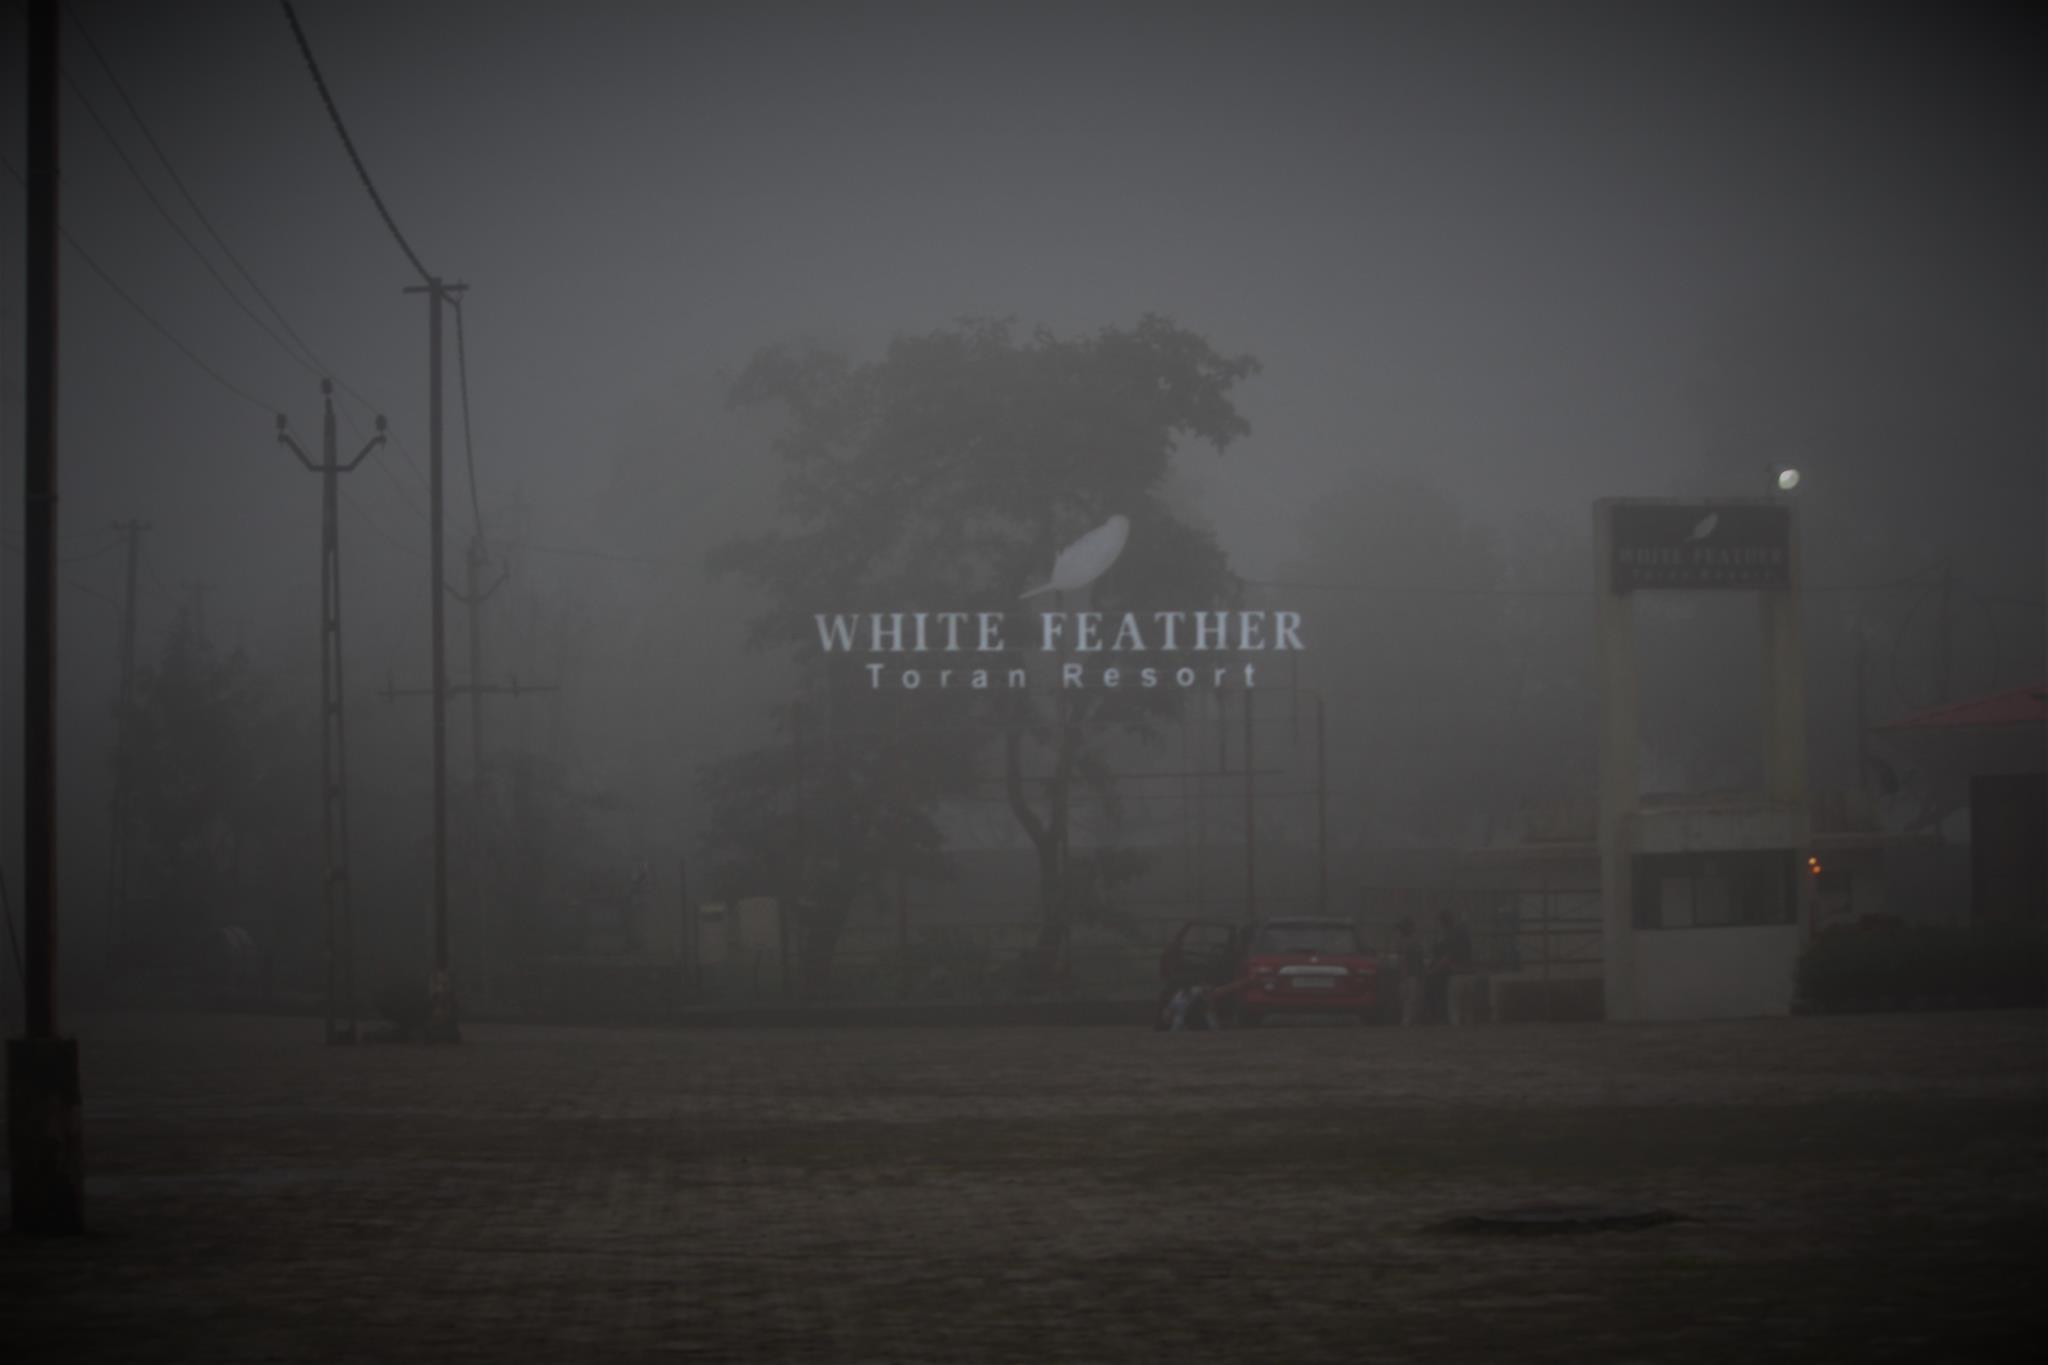 White Feather Toran Resort